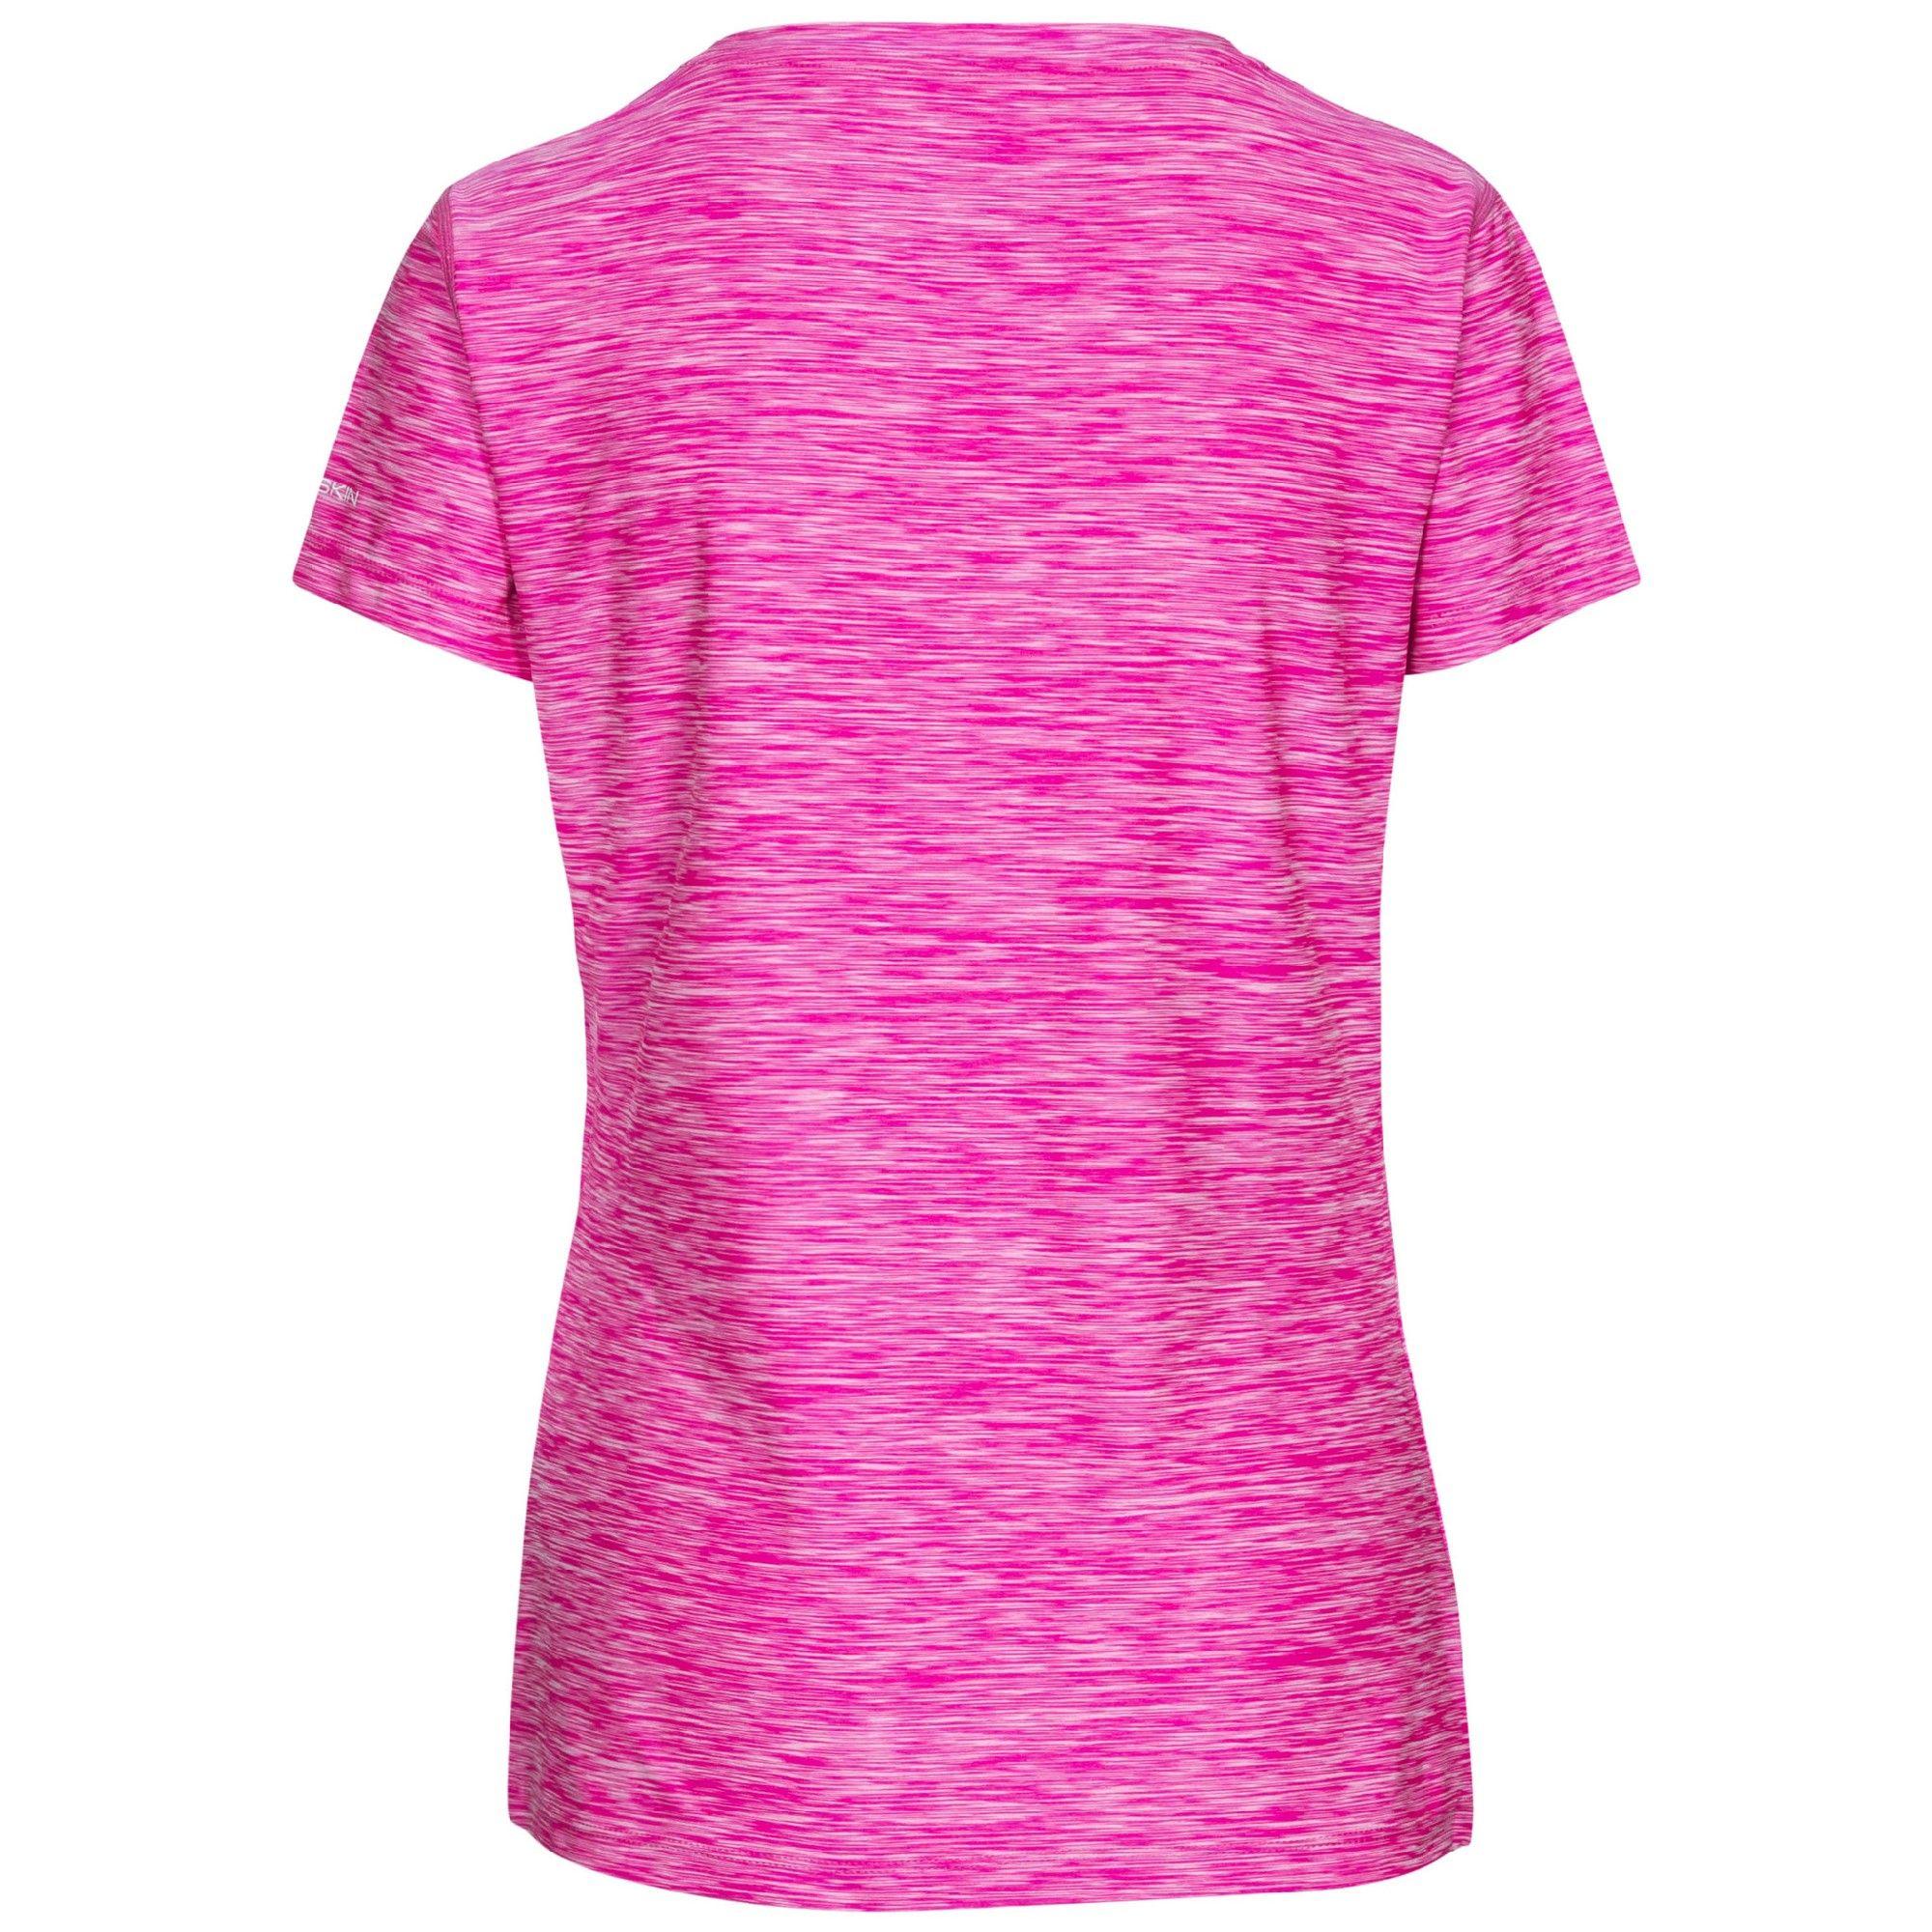 Trespass Womens/Ladies Daffney Active T-Shirt